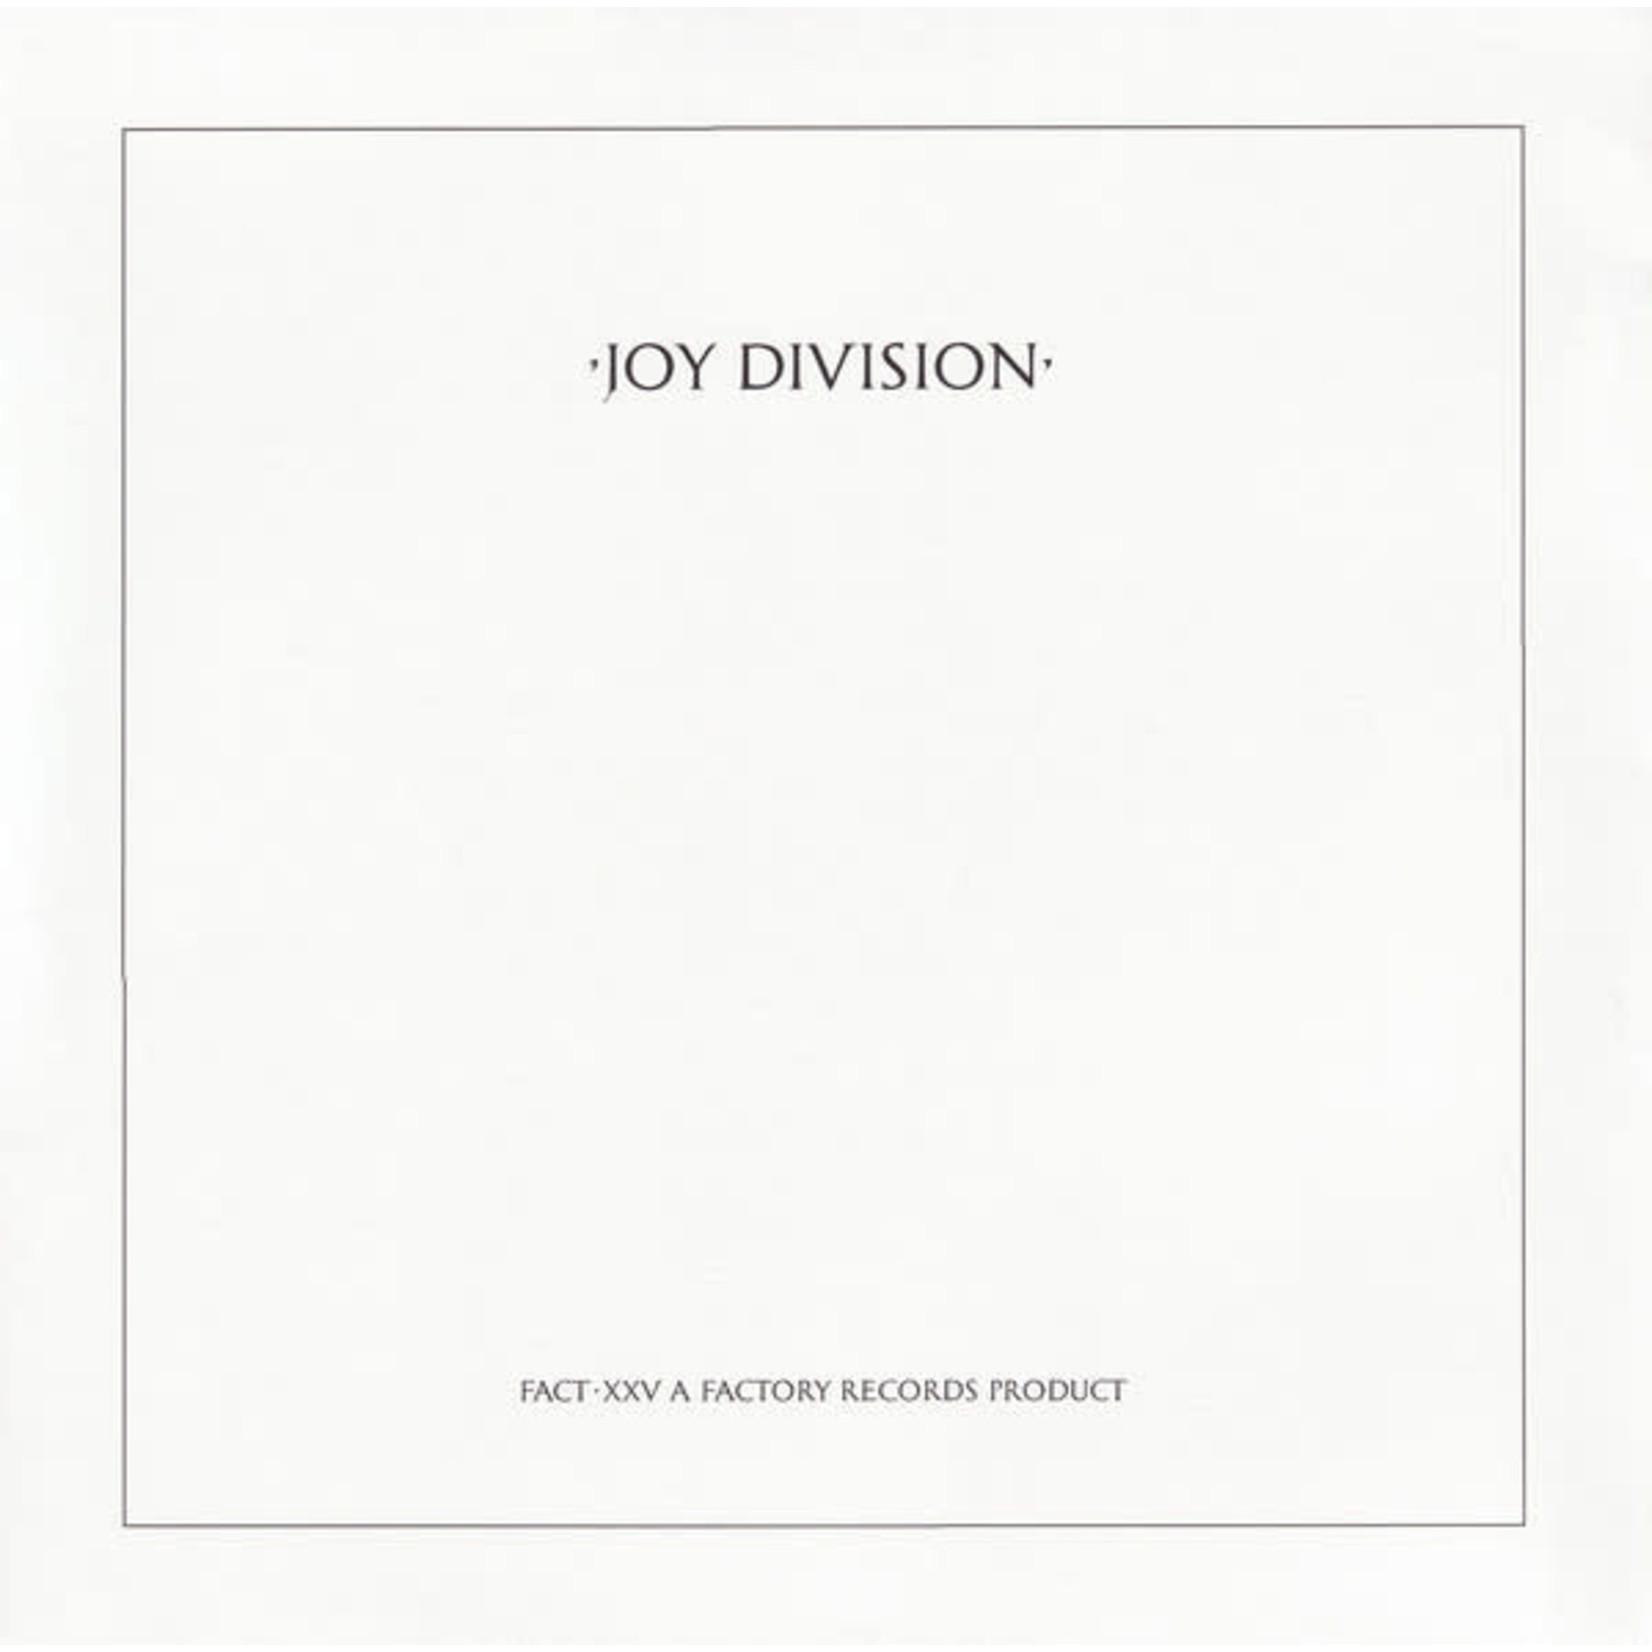 NEW ORDER & JOY DIVISION CLOSER (LP)